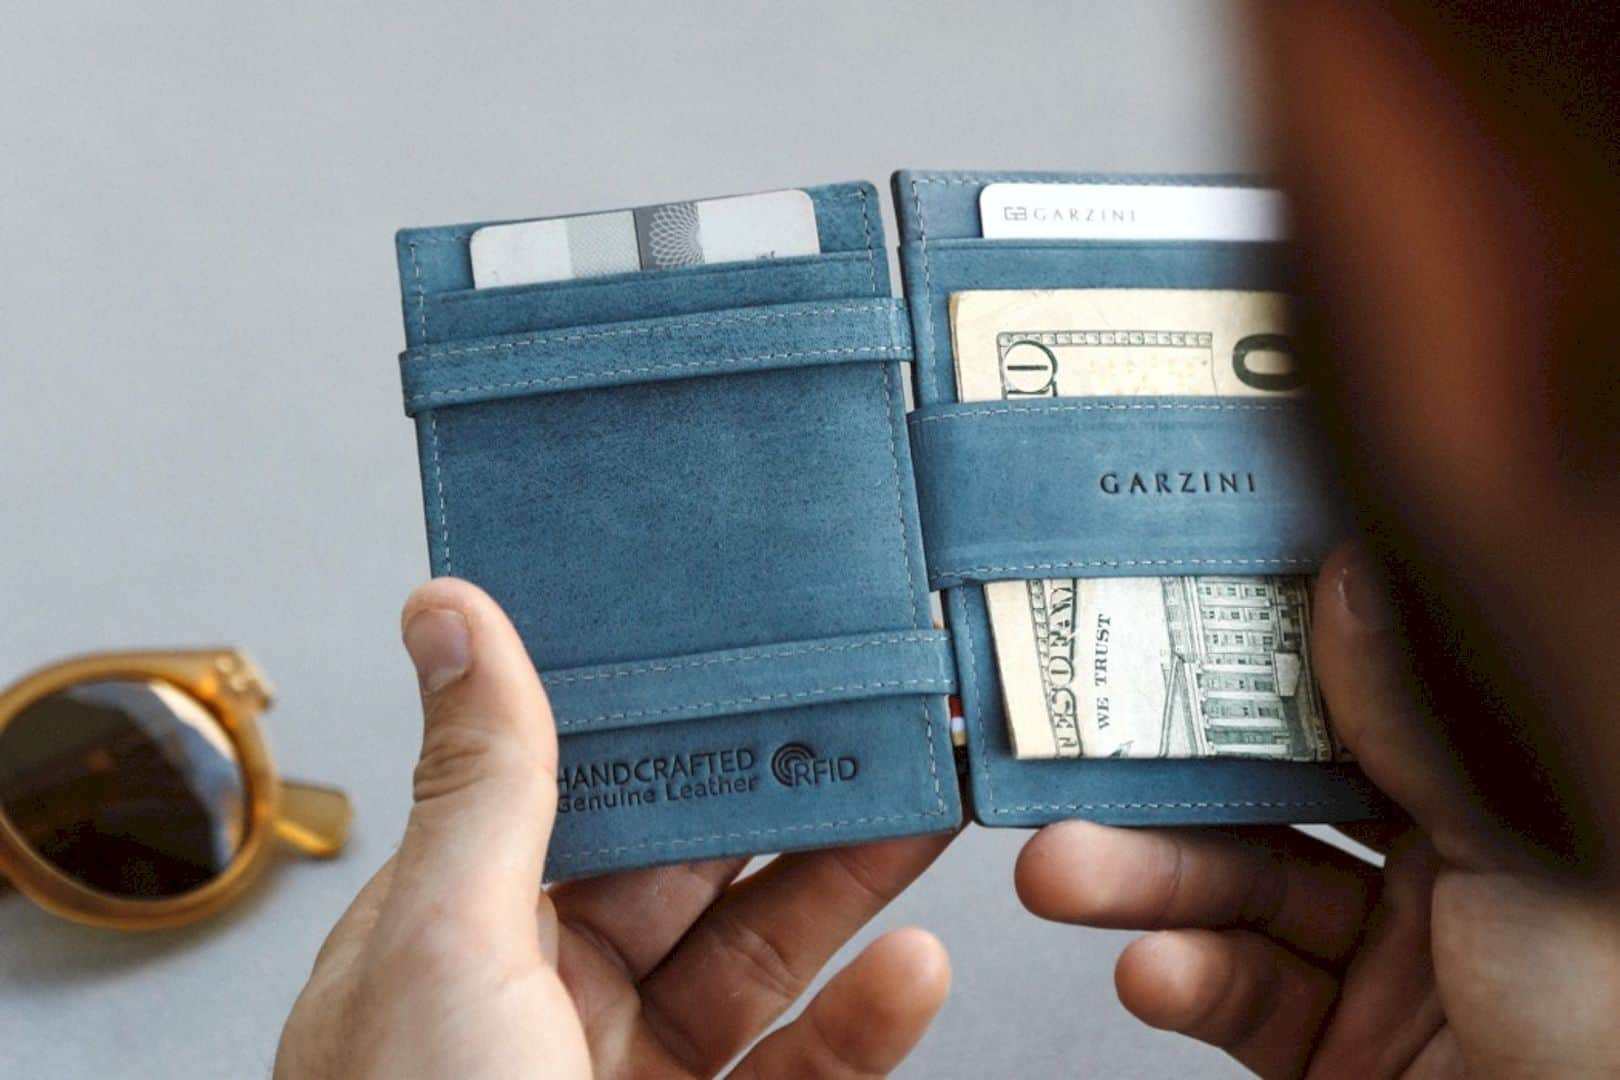 Garzini Cavare: The Slim Magic Wallet with Pull-Tab Slots